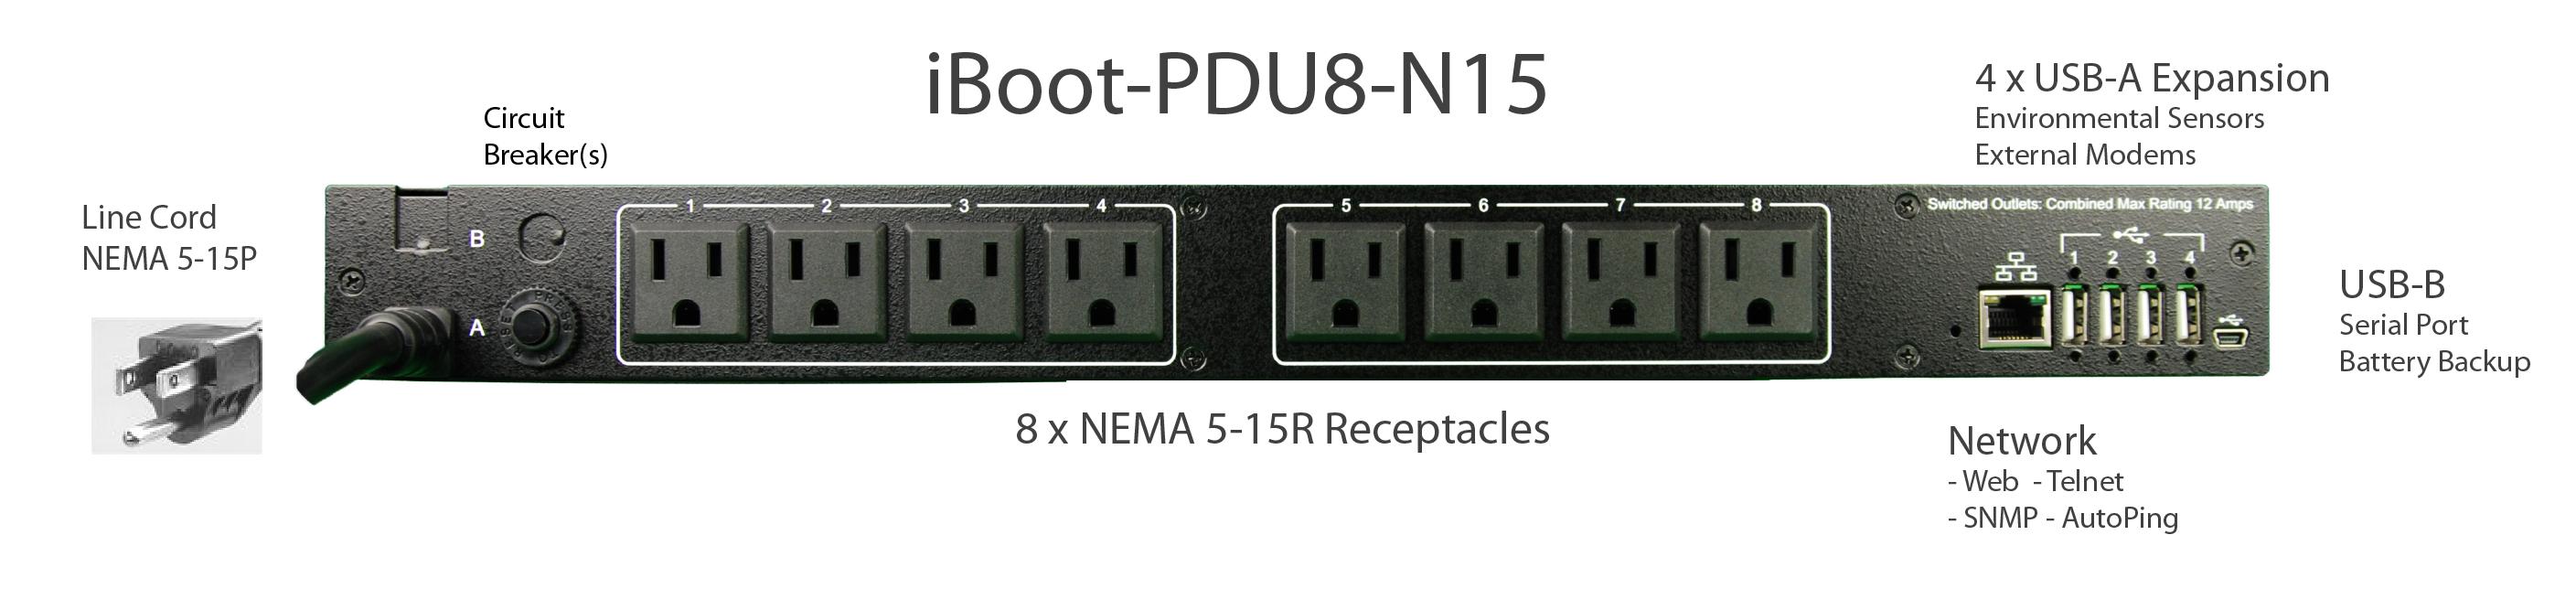 iBoot-PDU8-N15 for Remote Reboot,1 x NEMA 5-15P.